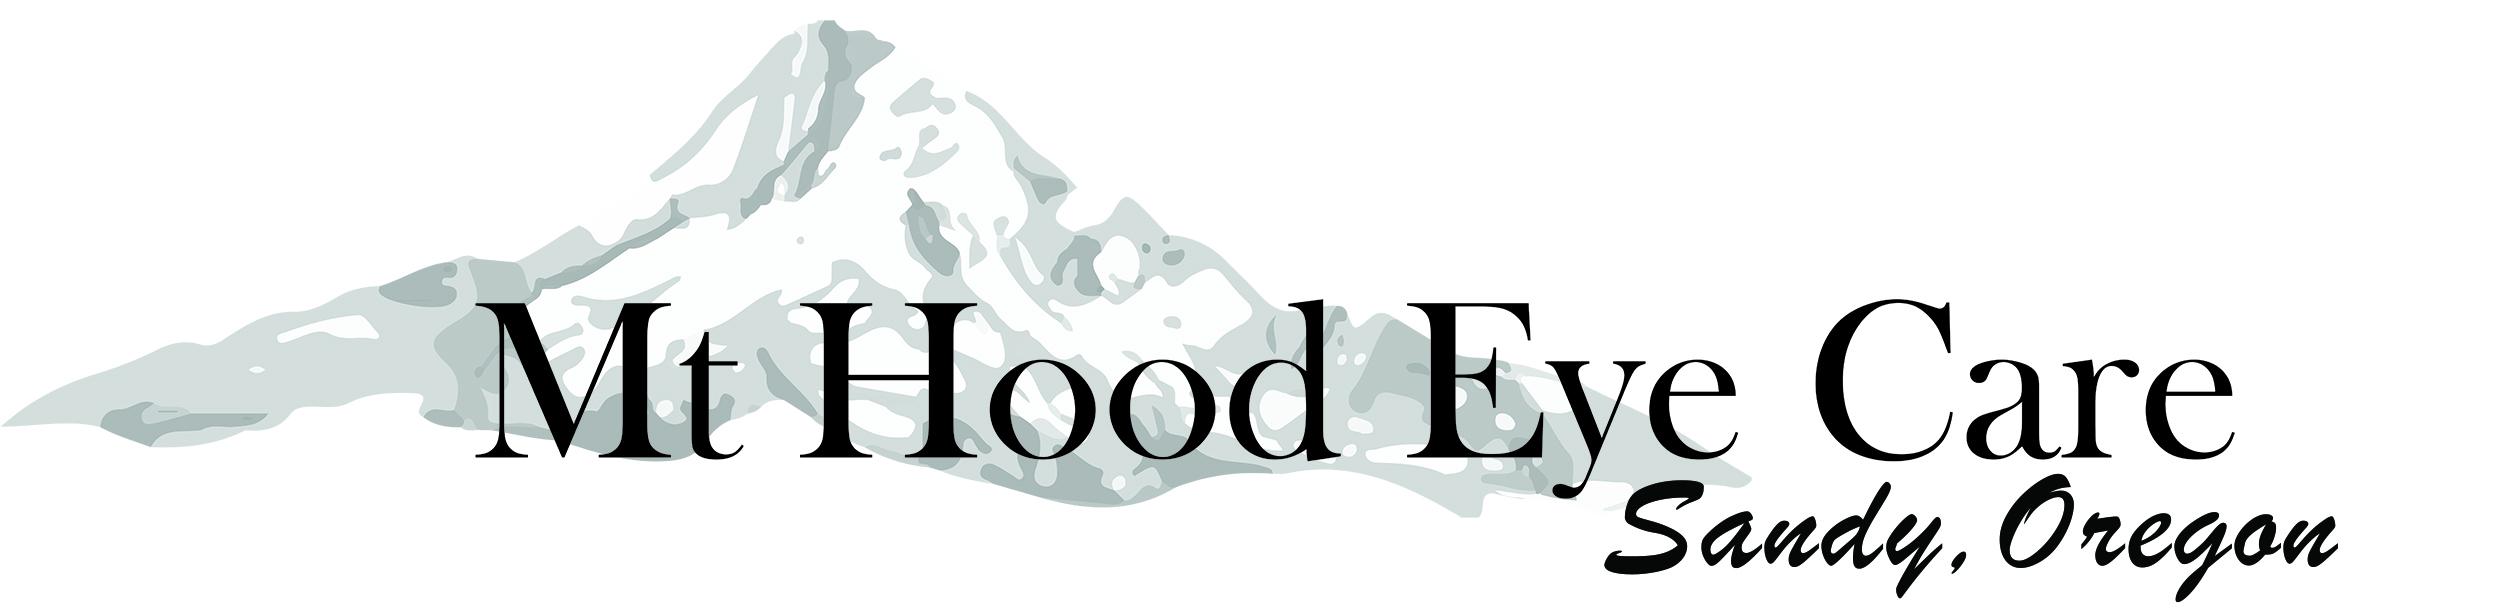 MtHoodEyeCare-Layered-Sandy-2500v3